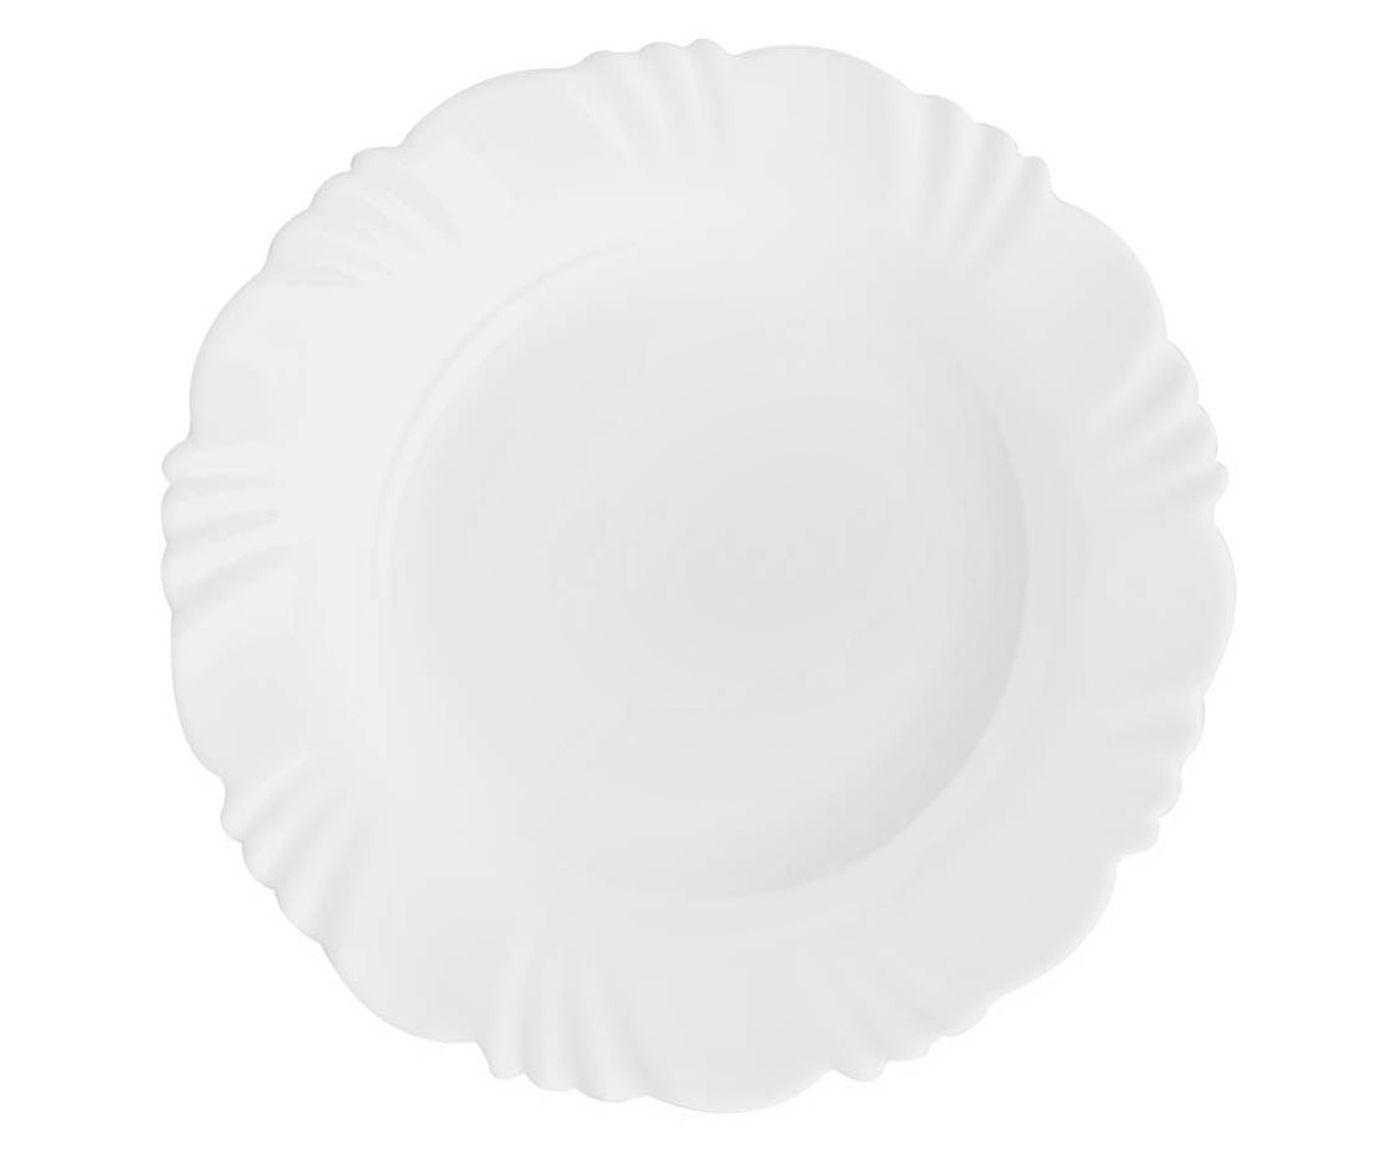 Prato Fundo Bott - 23,5cm   Westwing.com.br